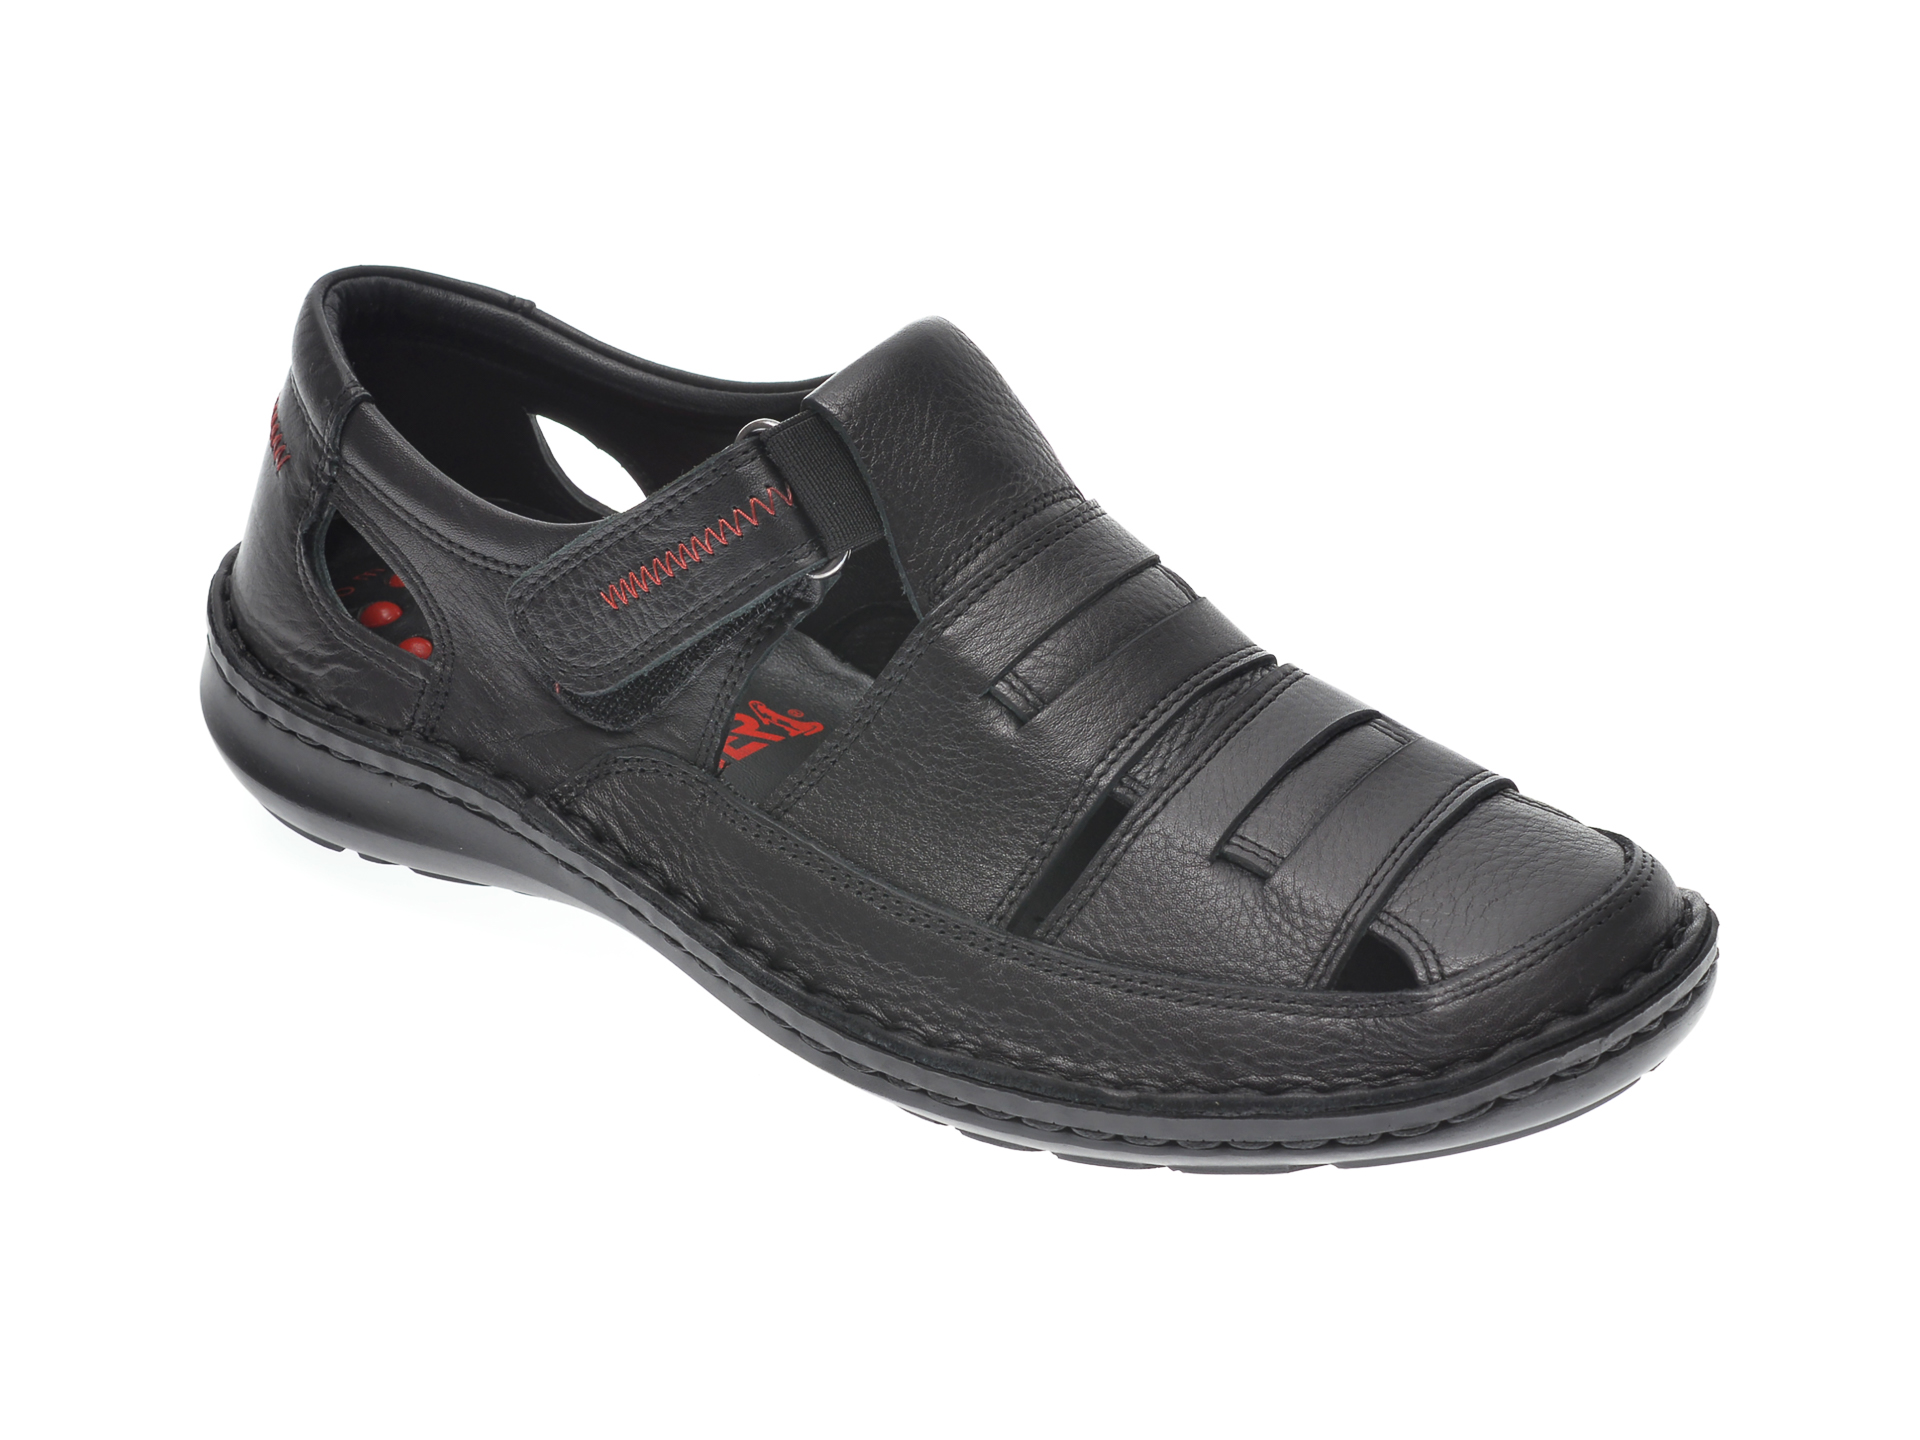 Sandale OTTER negre, 9562, din piele naturala imagine